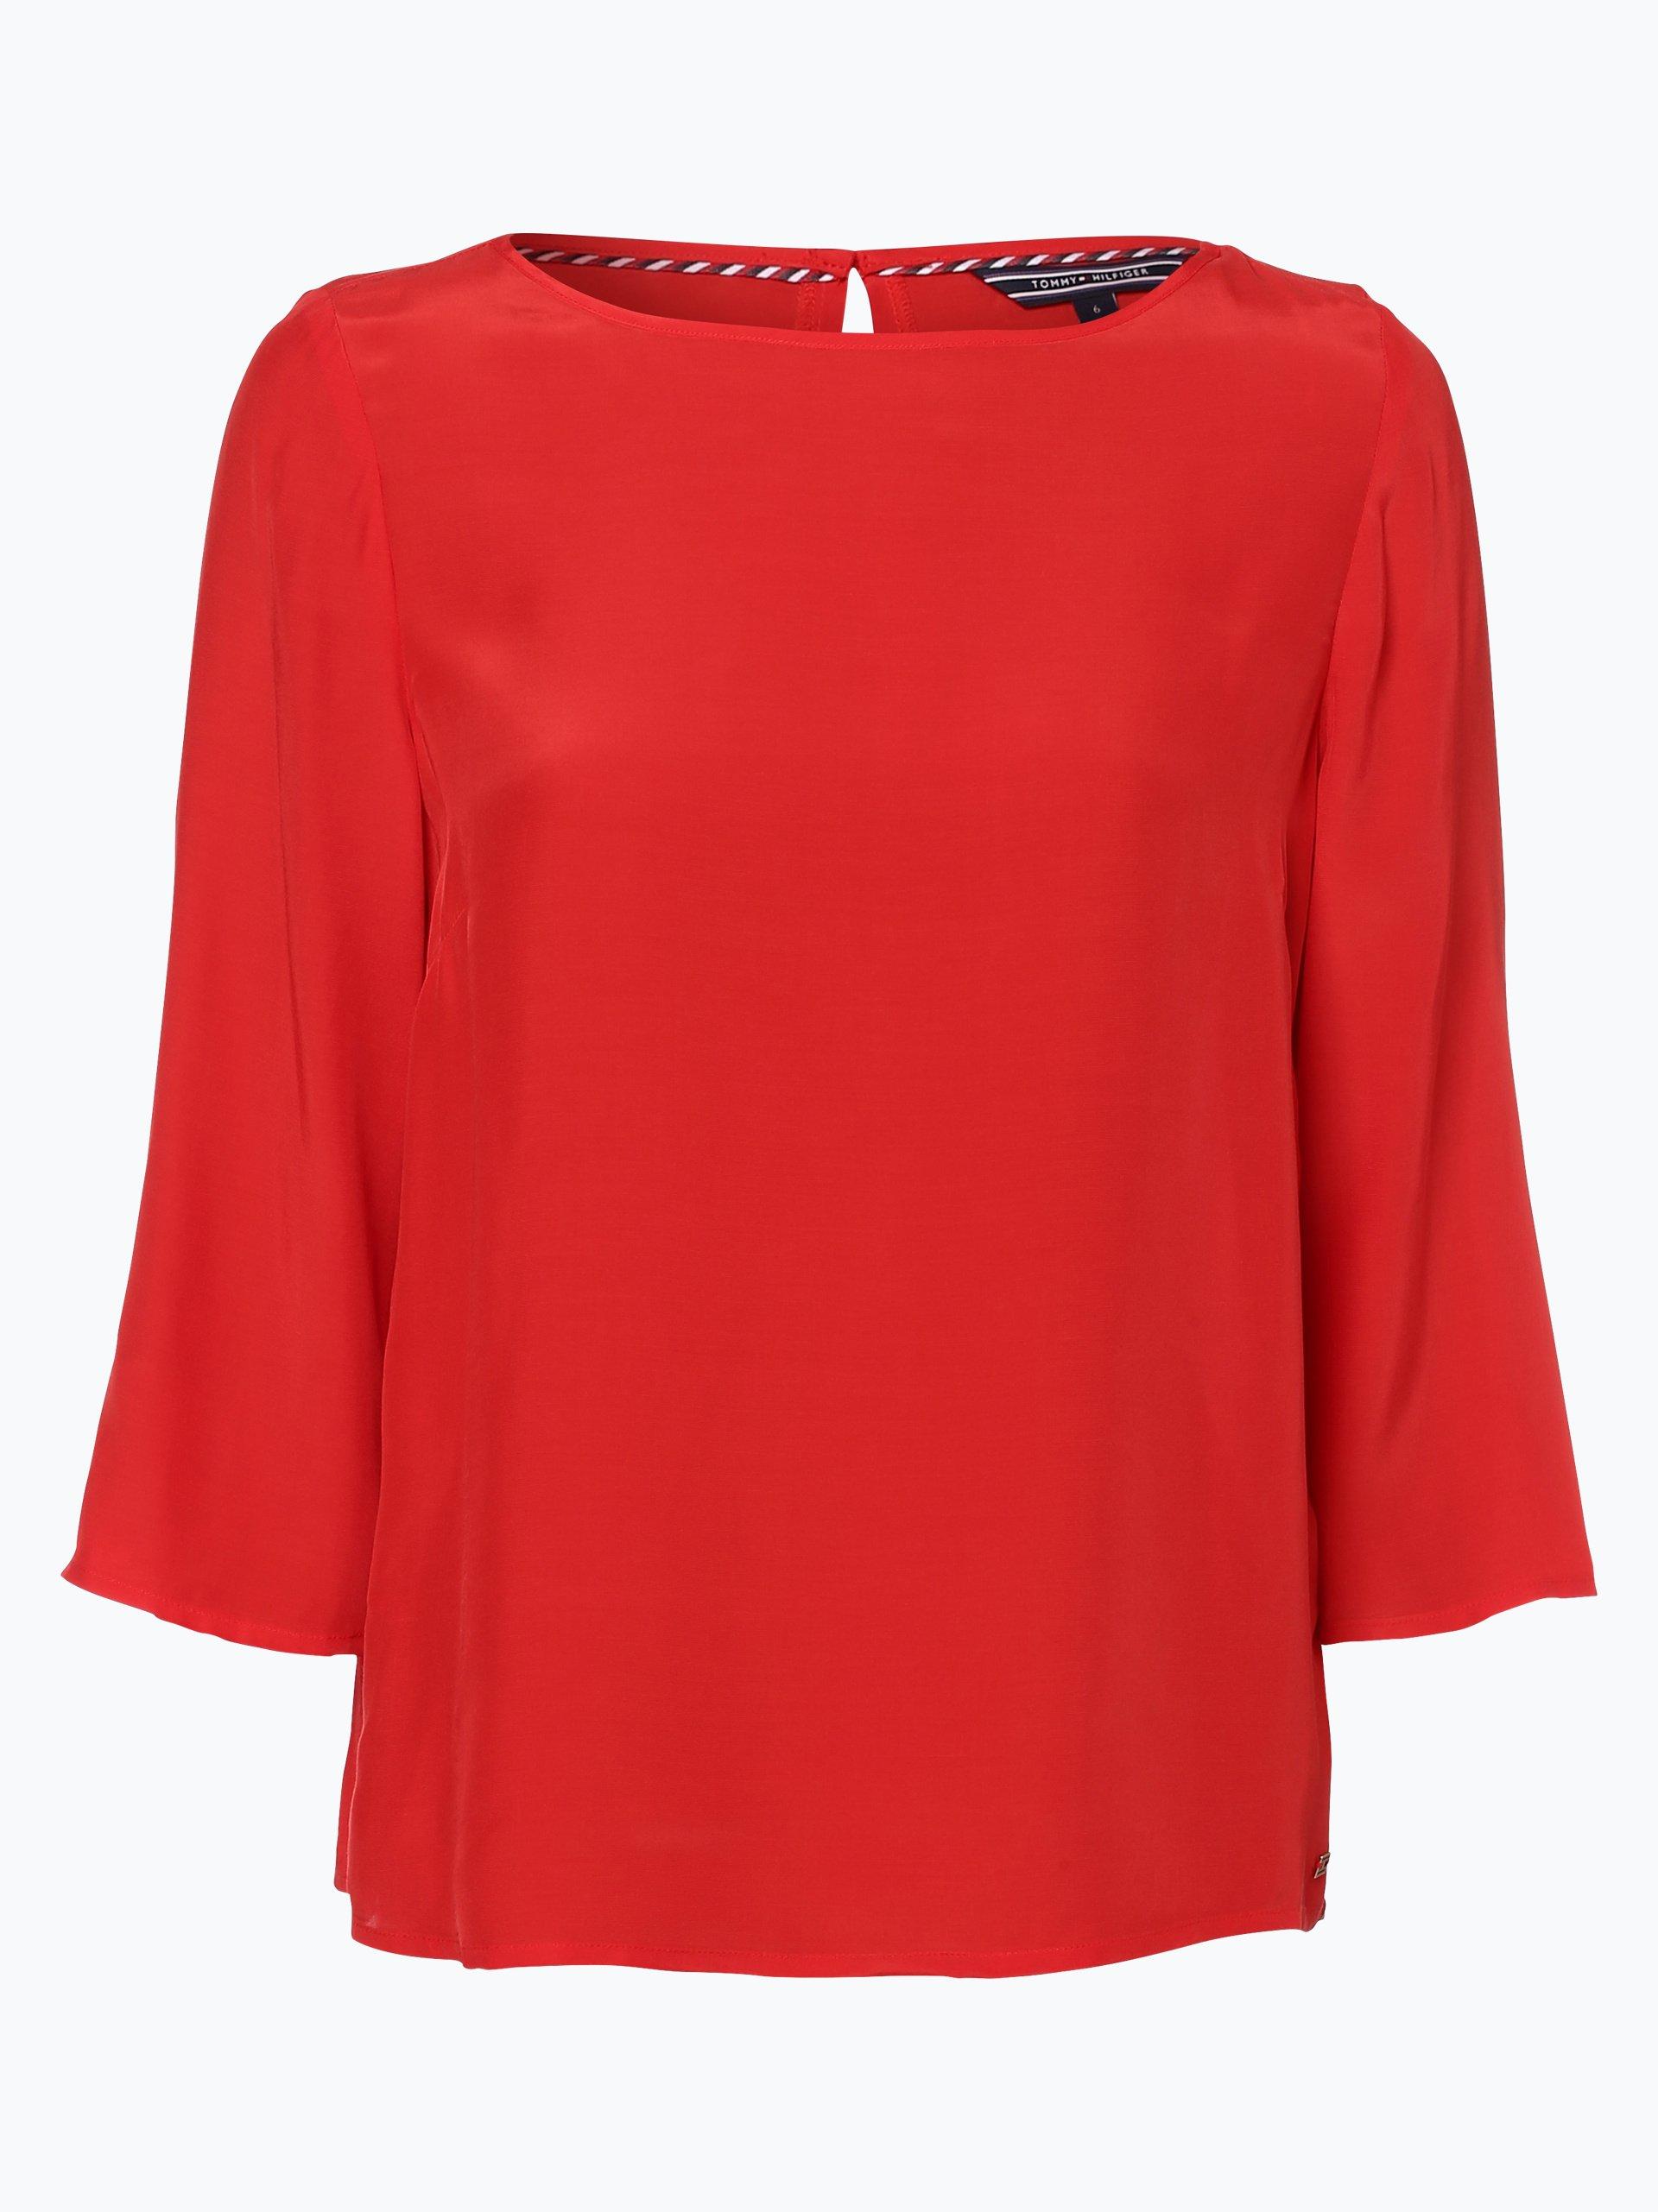 Tommy Hilfiger Damen Blusenshirt